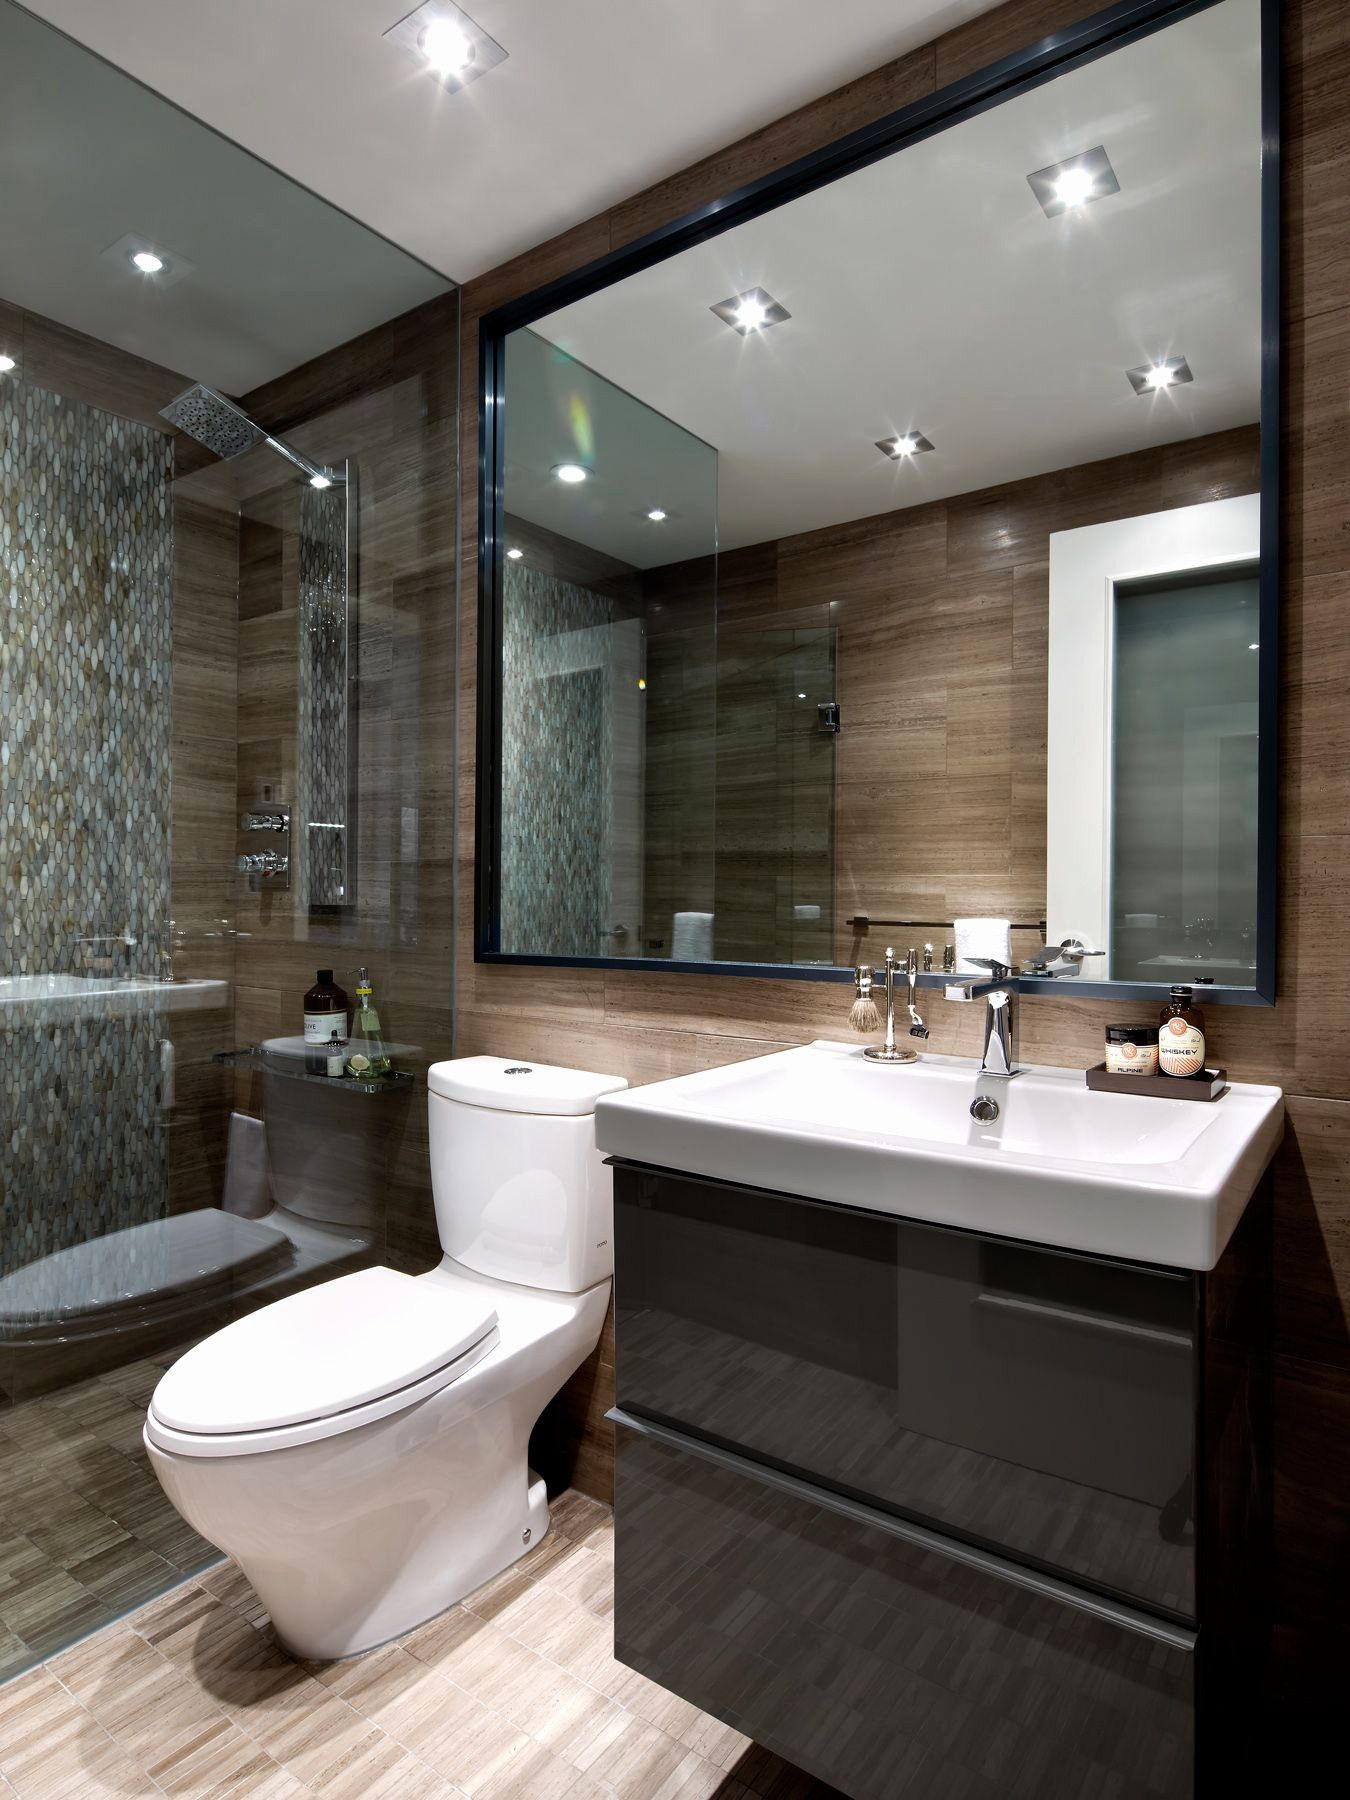 12 Modern Bathroom Ideas Photo Gallery Exquisite And Also Stunning Diyhous Bathroom Design Small Modern Modern Small Bathrooms Bathroom Interior Design